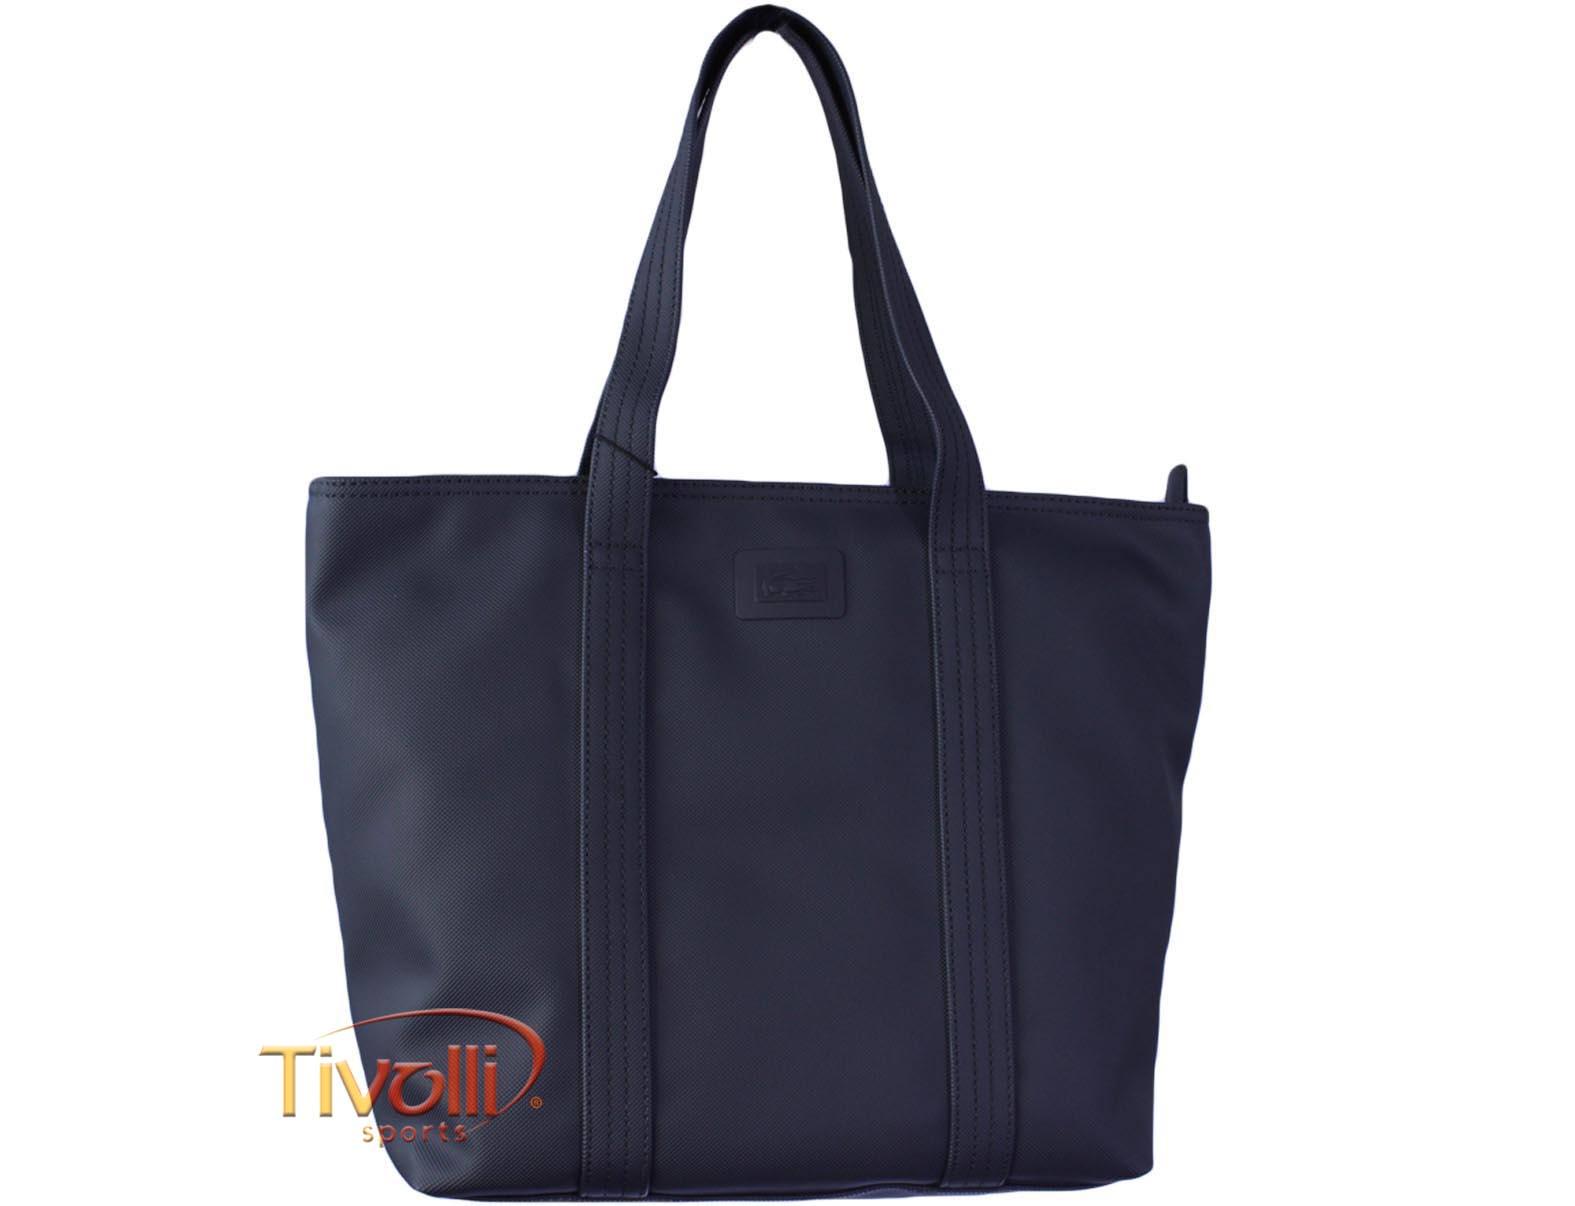 Bolsa Lacoste Medium Shopping Bag   Azul Marinho   c8fe08ceb4